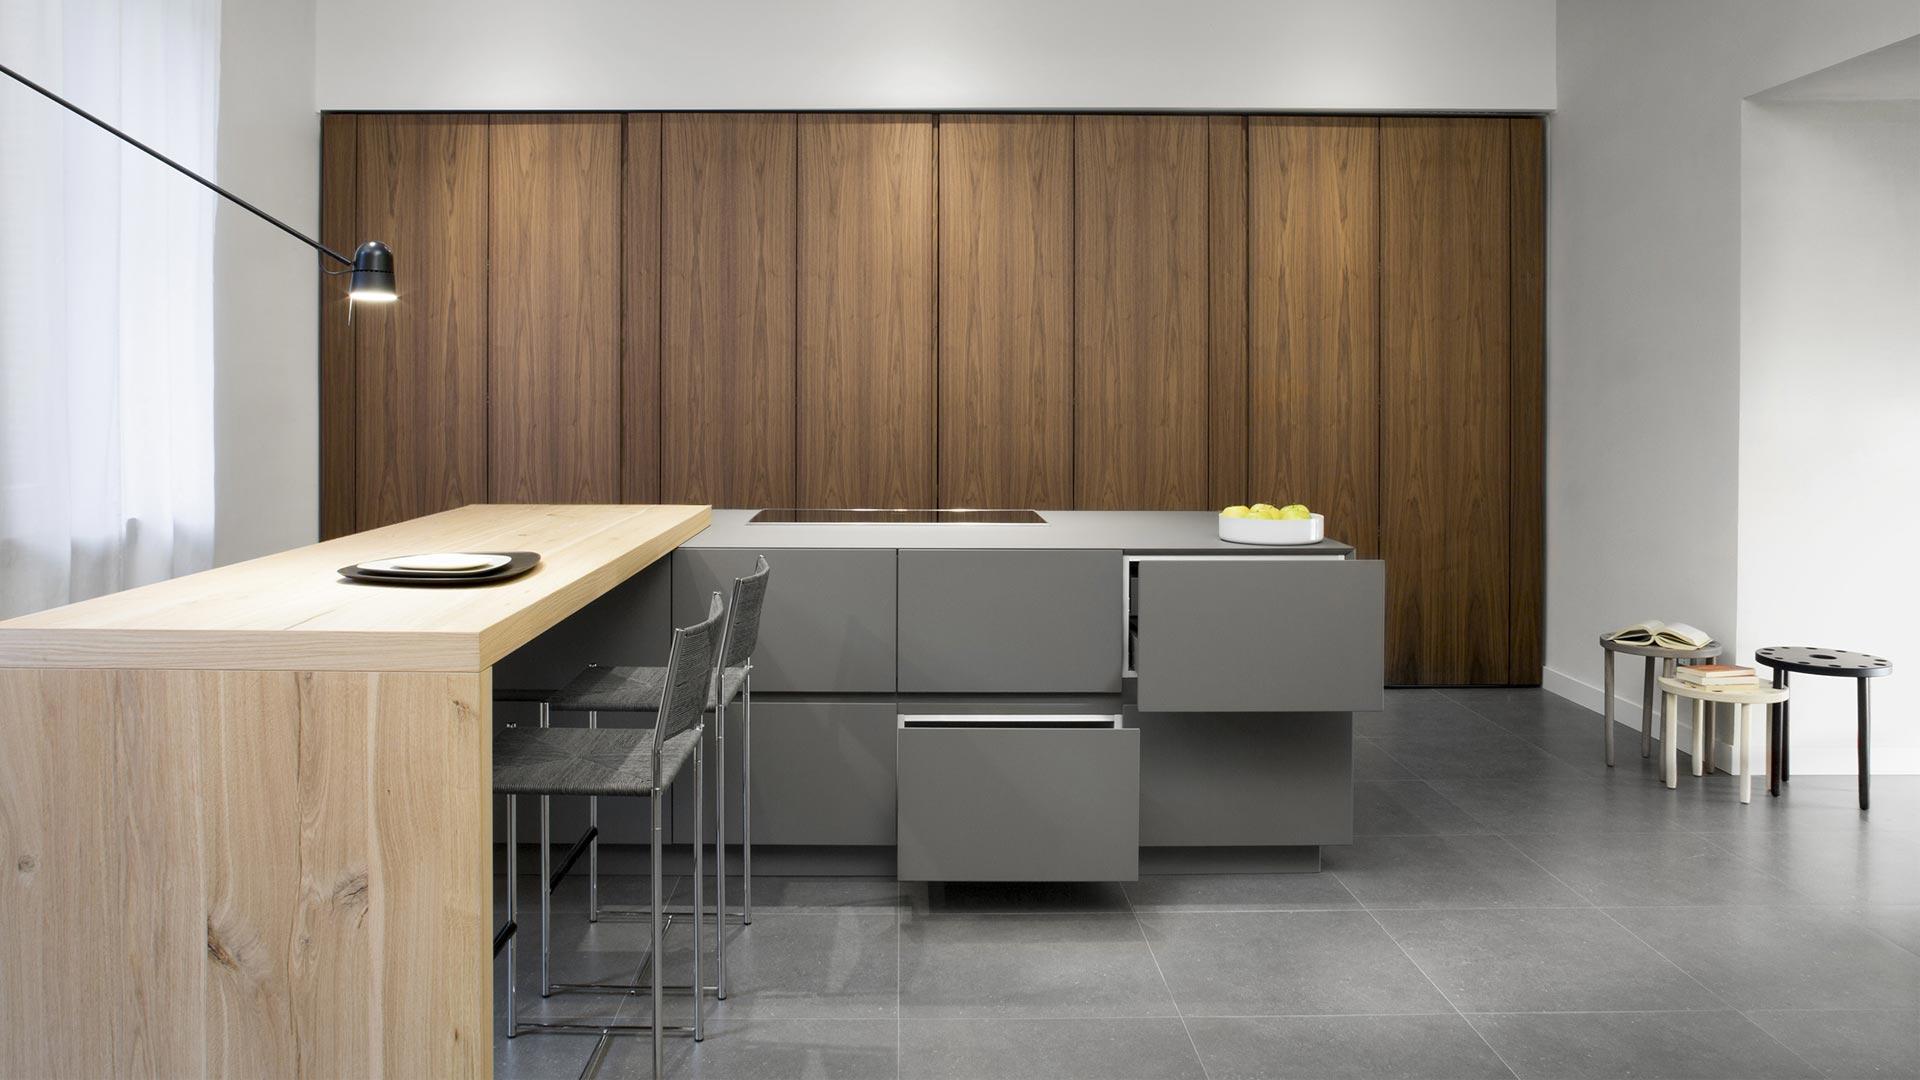 retractable kitchen